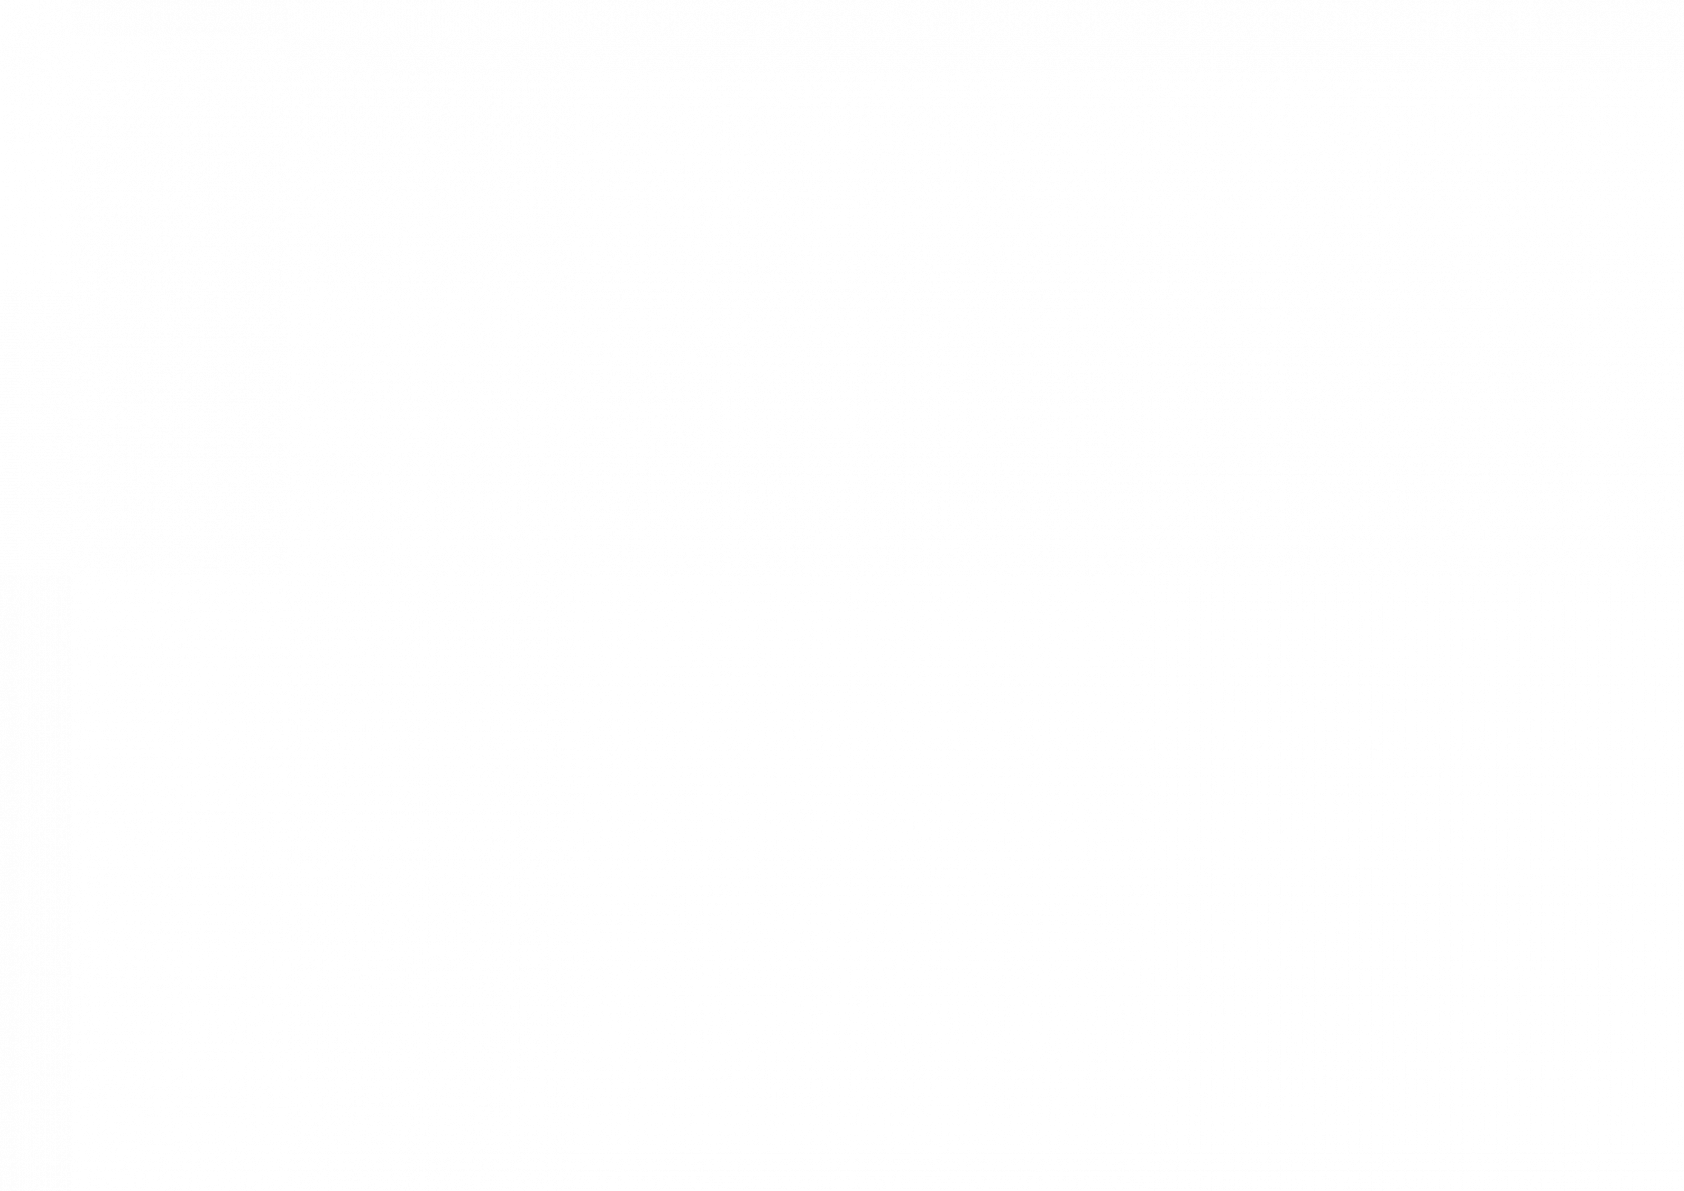 pieghevole-cardin-001